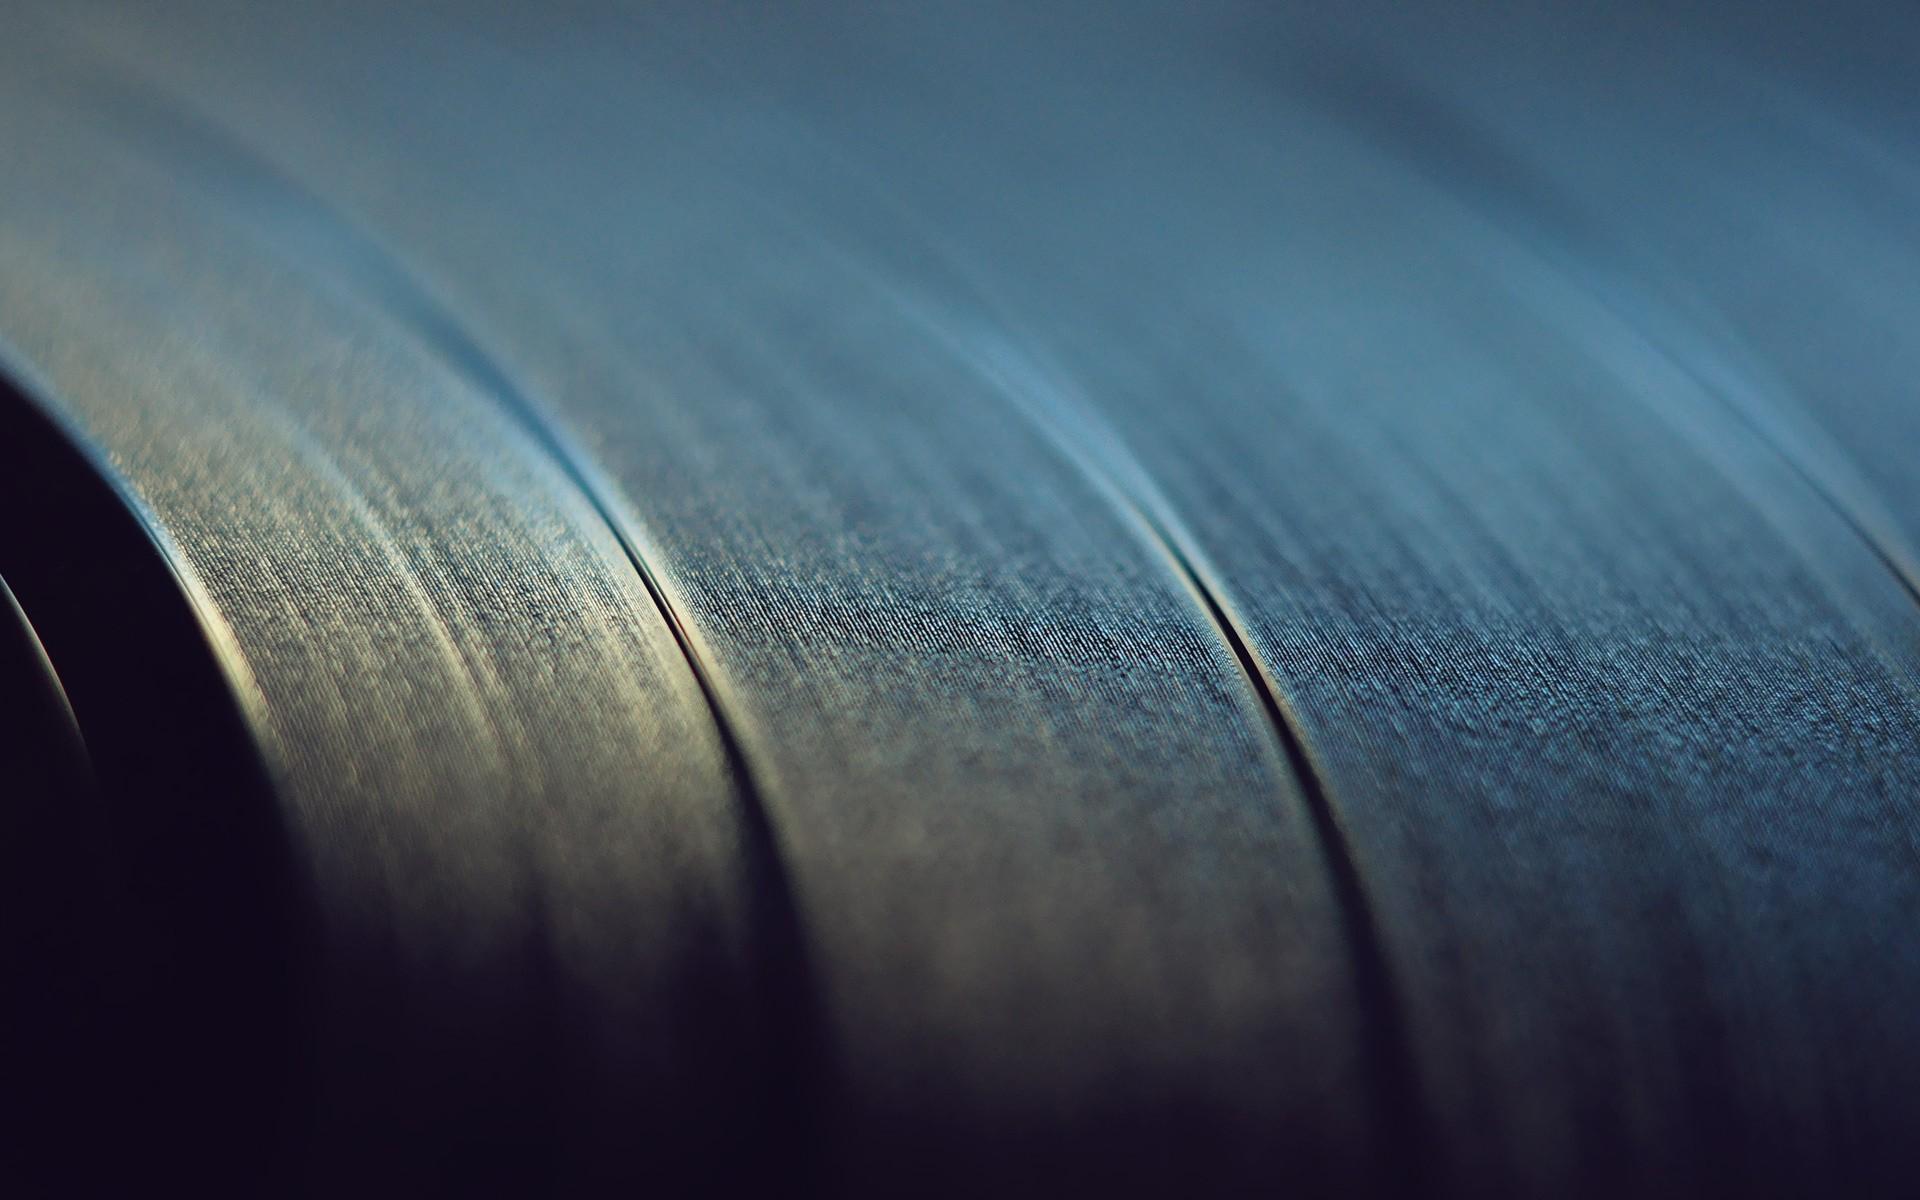 macro simple record album wallpaper 1920x1200 7840 WallpaperUP 1920x1200